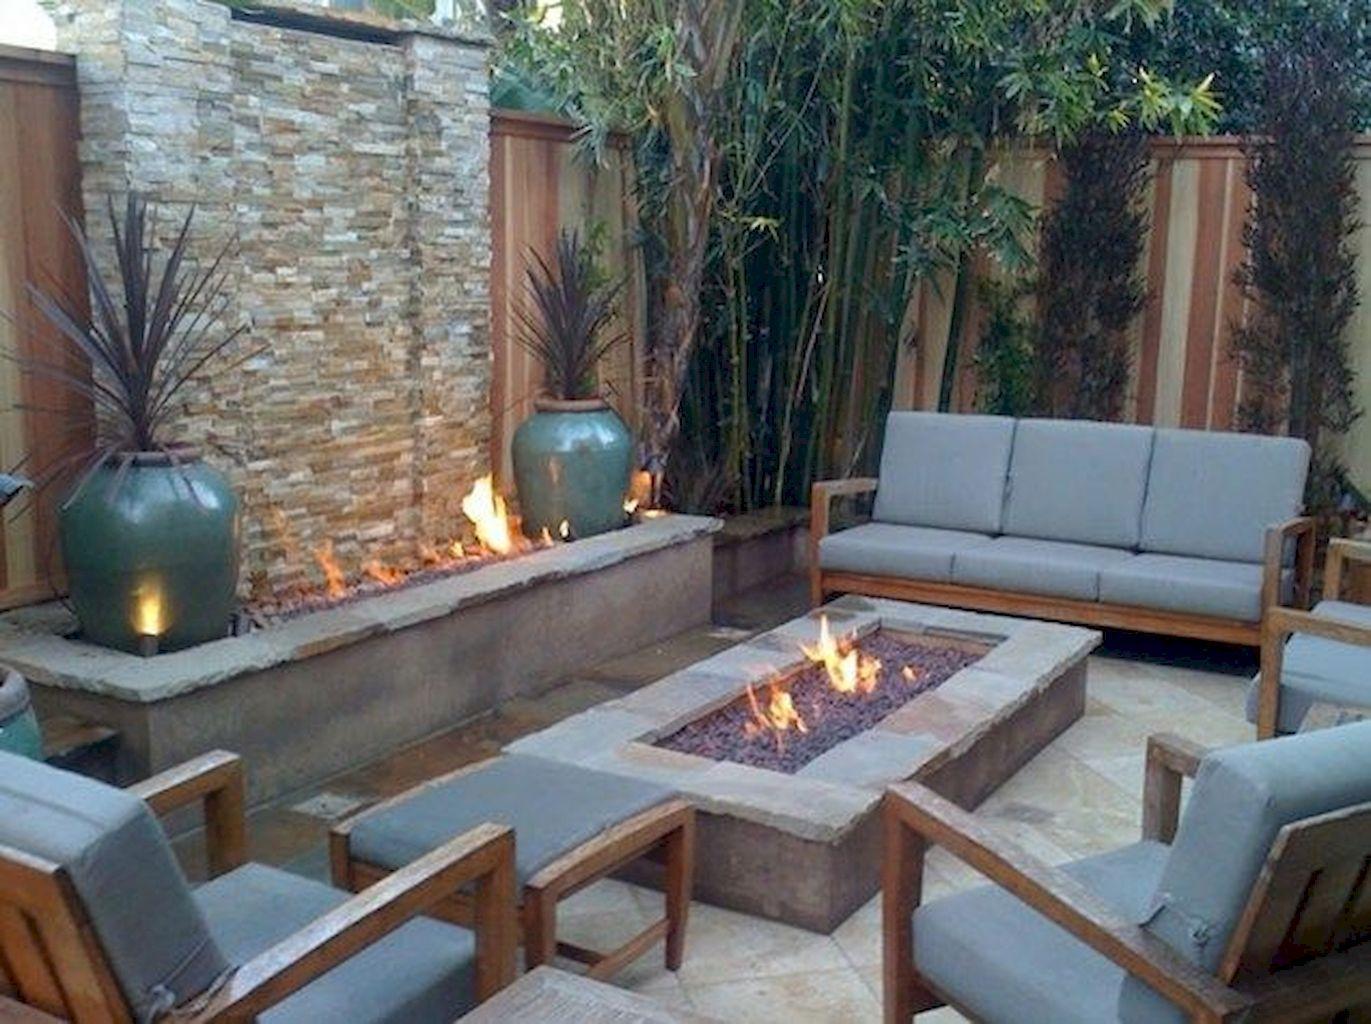 72 gorgeous small backyard landscaping ideas decoración on gorgeous small backyard landscaping ideas id=12174